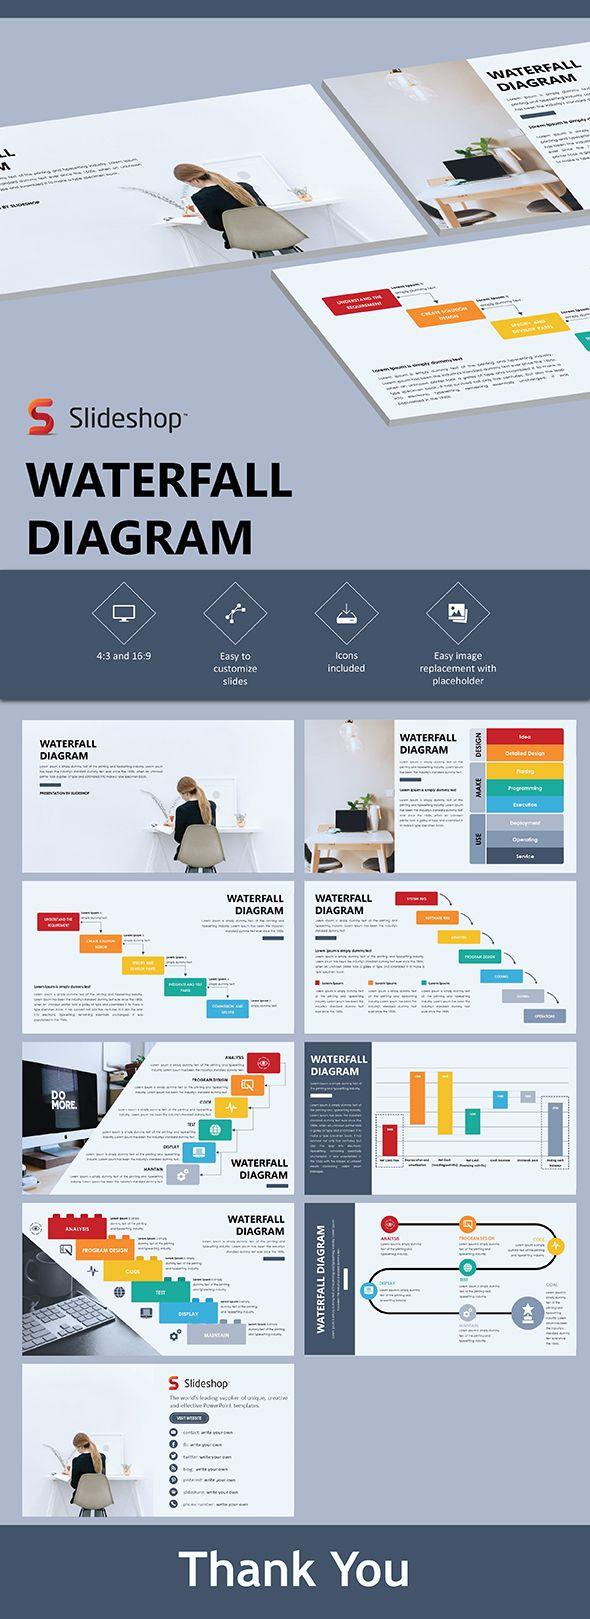 Waterfall Diagram - PowerPoint Template